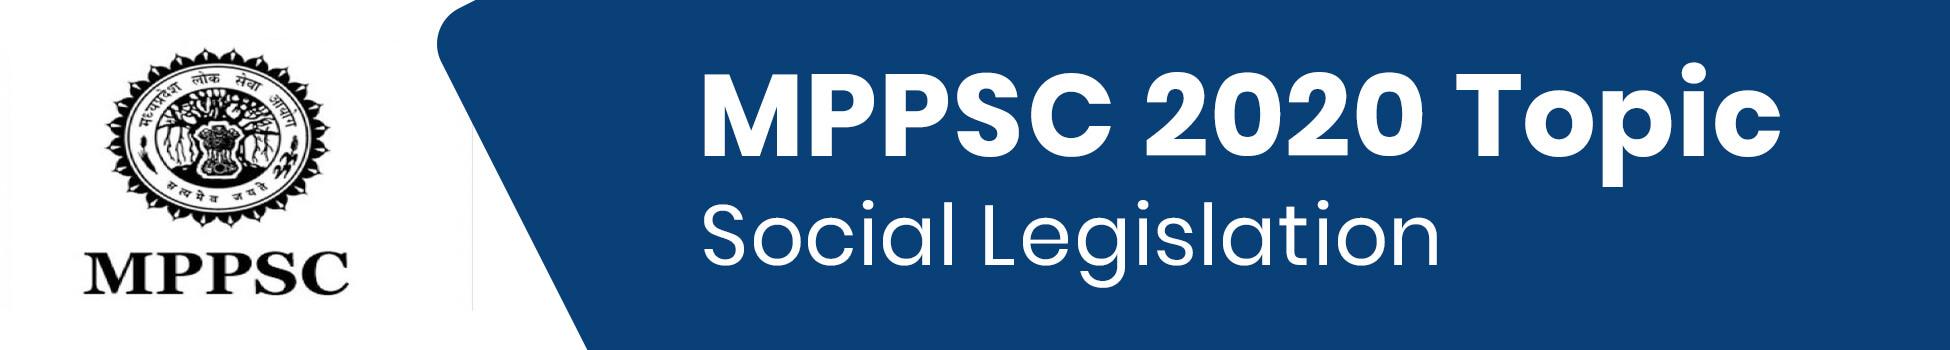 MPPSC 2020 Topic - Social Legislation